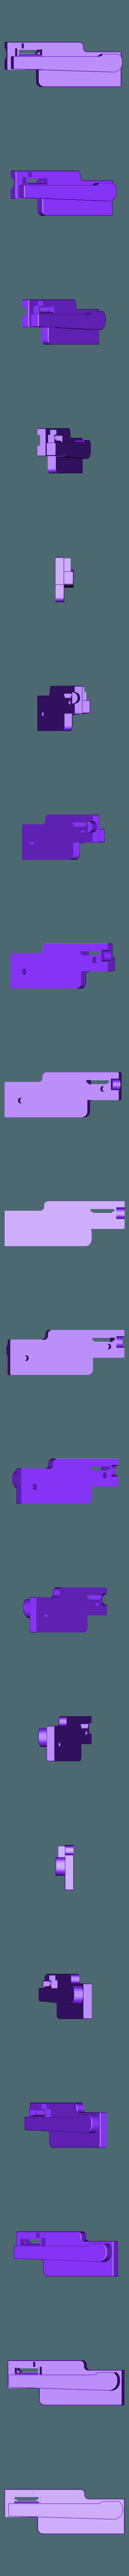 MG_hinten_links.stl Download free STL file Machine Gun Spandau MG08 • 3D print object, wersy